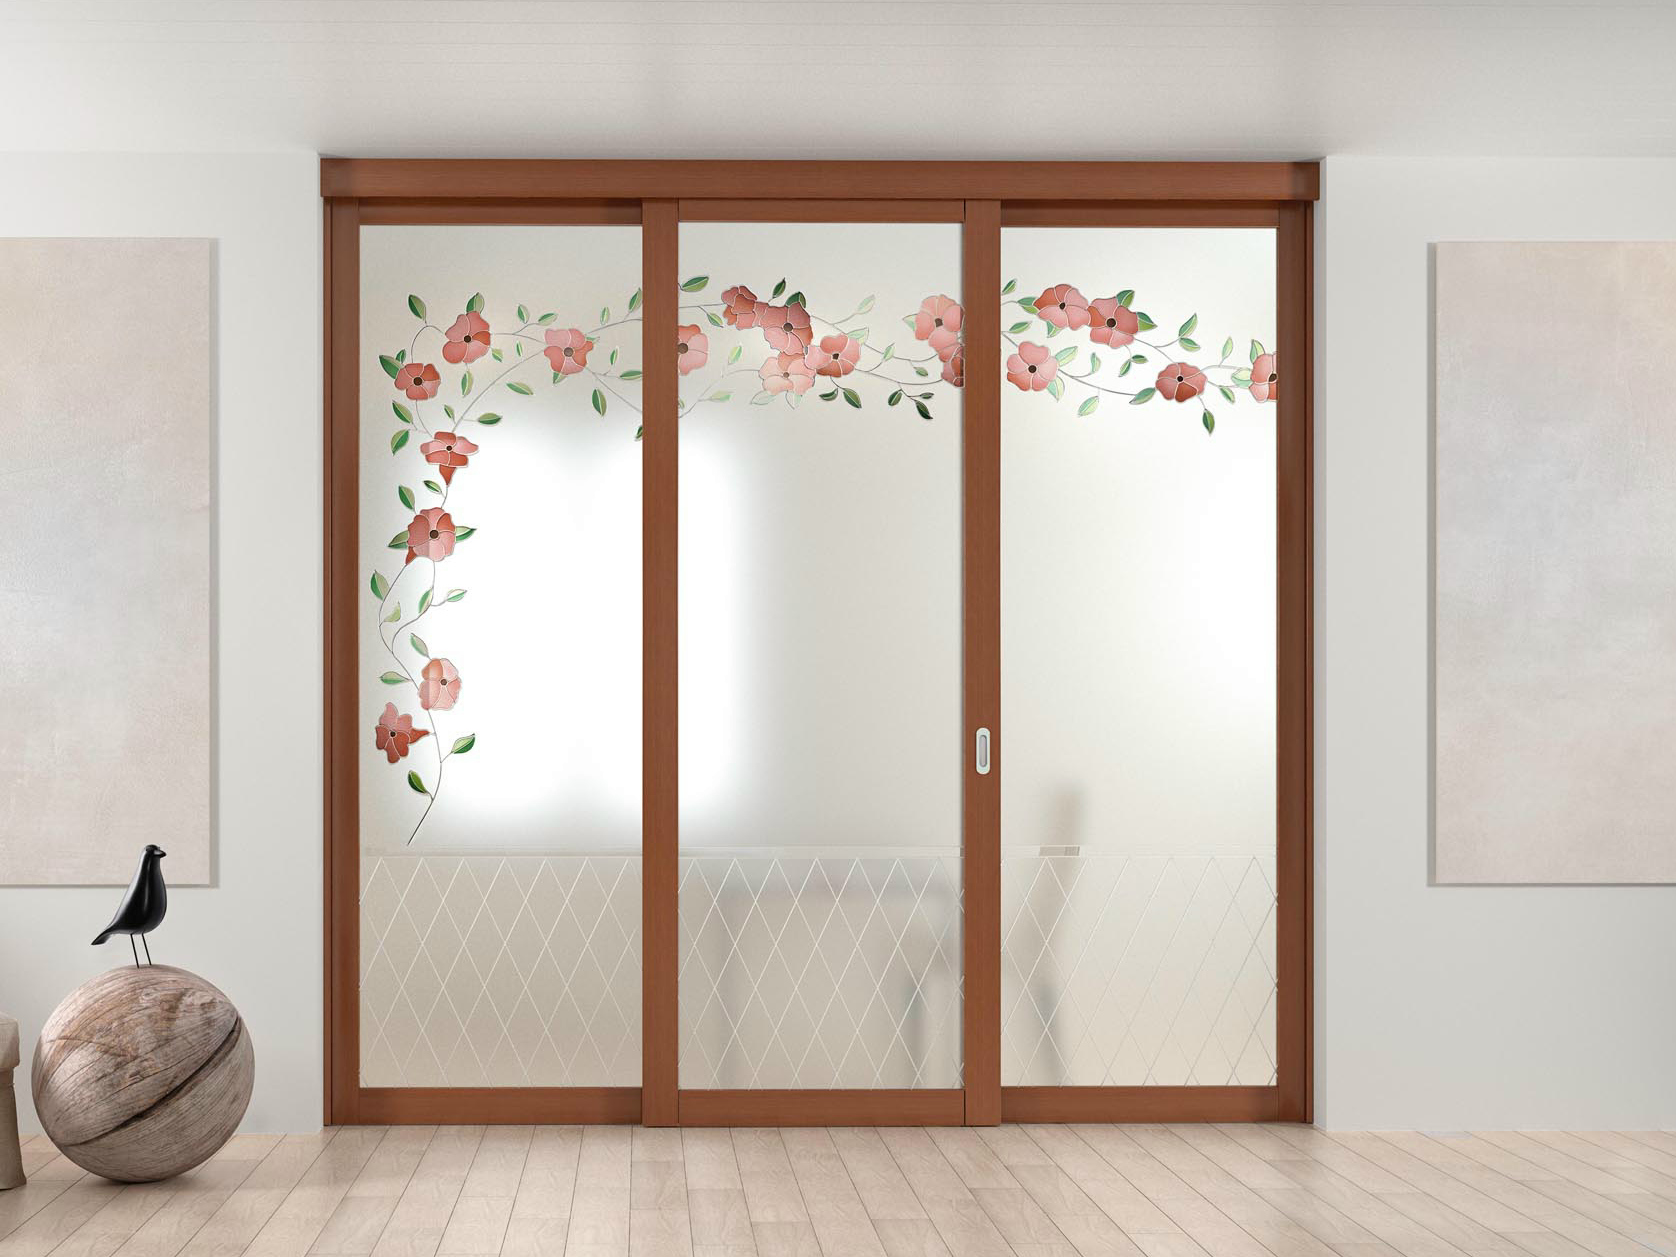 Puerta corrediza de vidrio arianna by foa - Vidrios para puertas ...